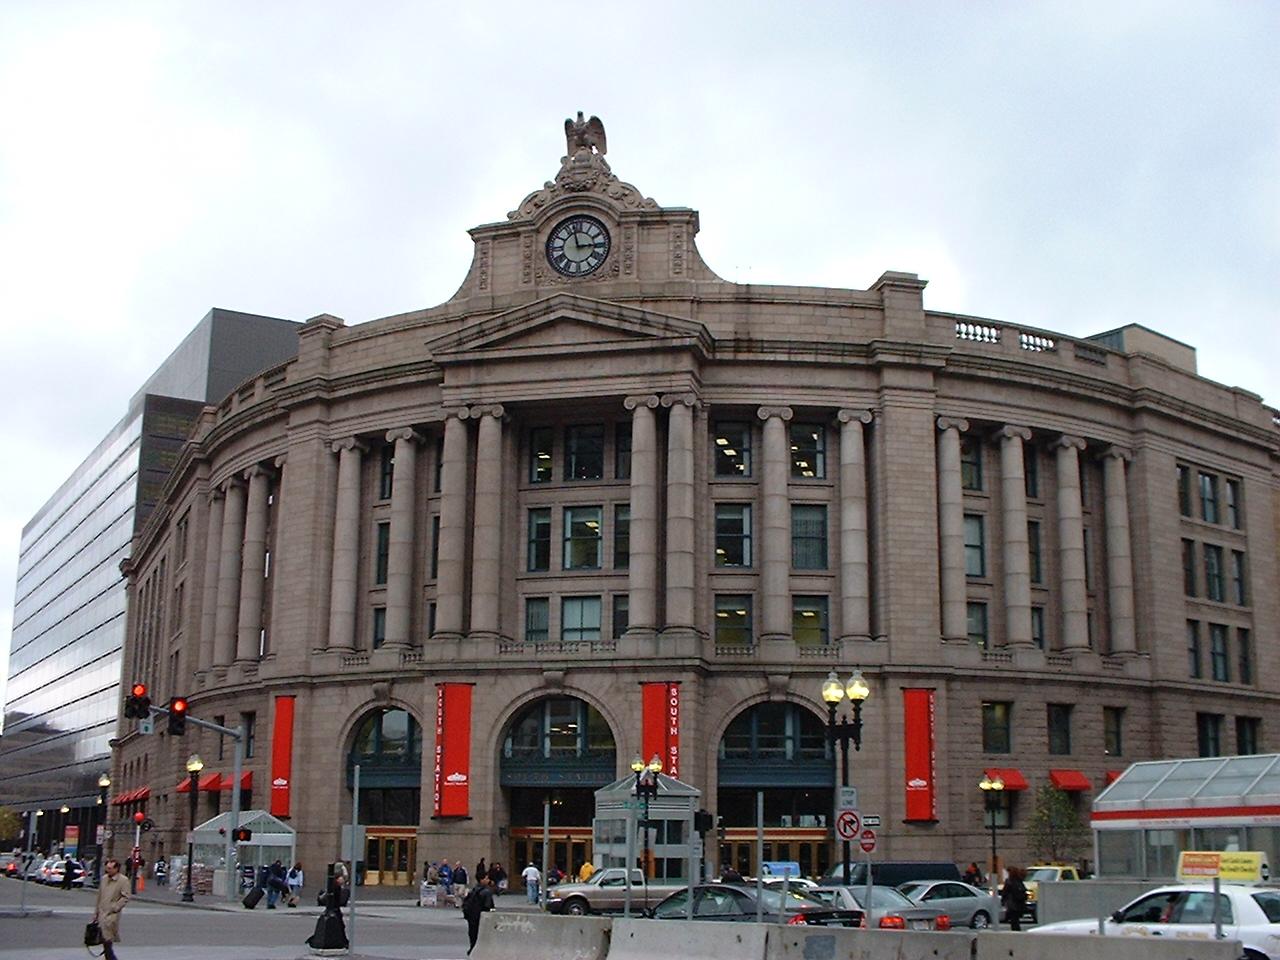 Frontansicht der South Station